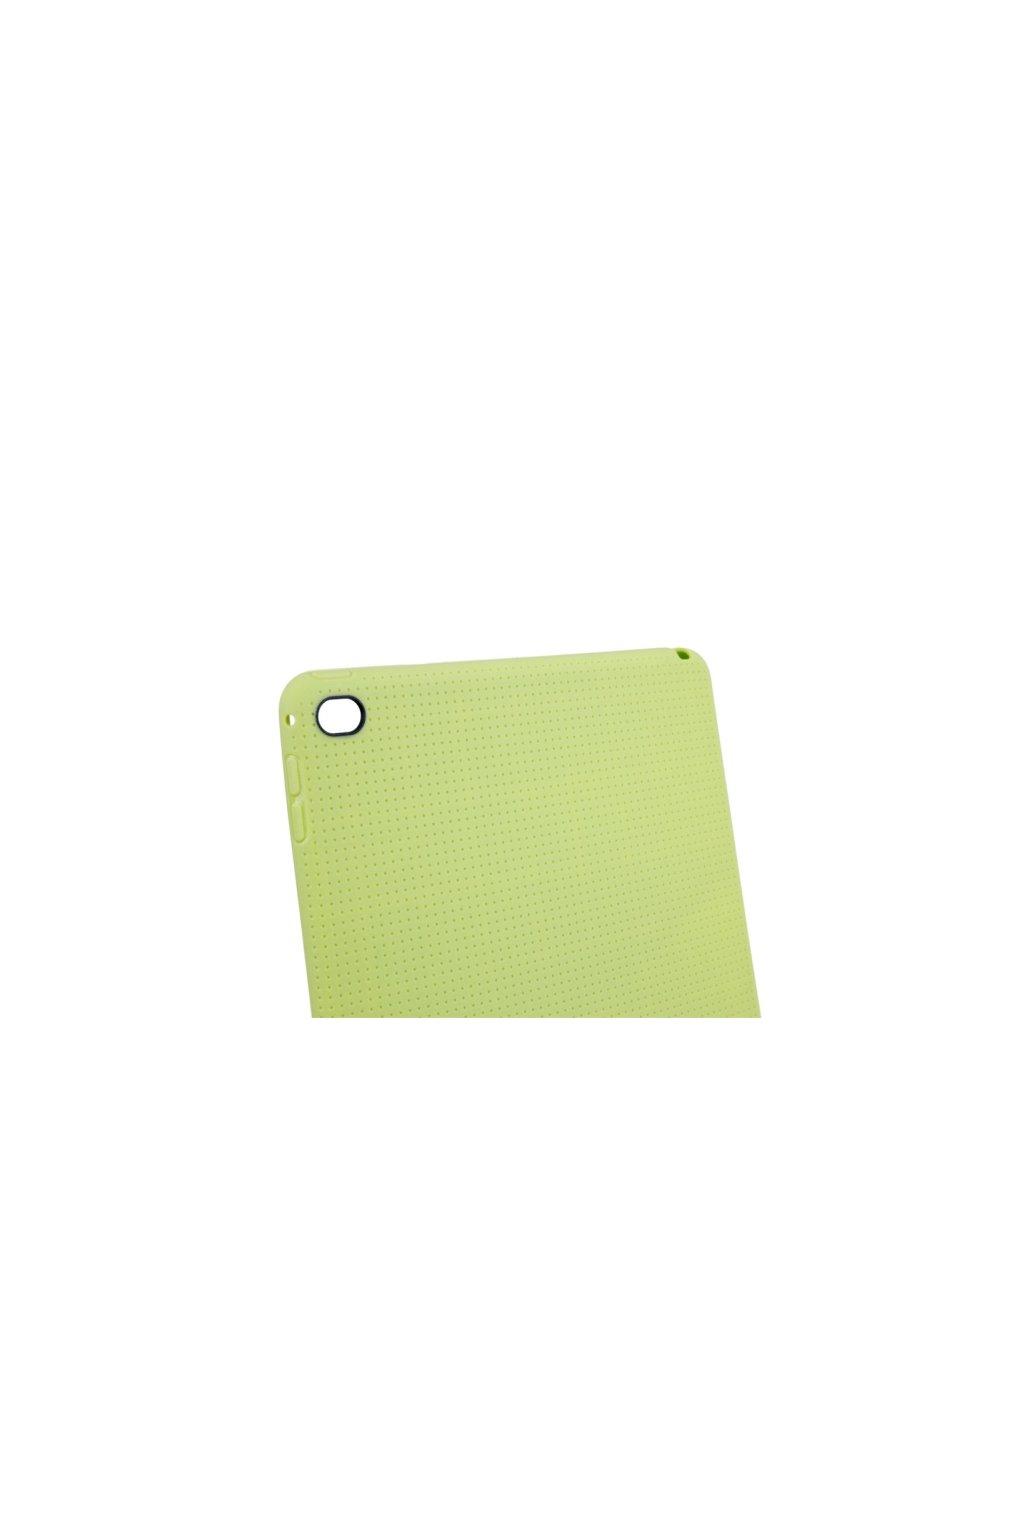 Pouzdro TPU iPad Air 2, green/zelená